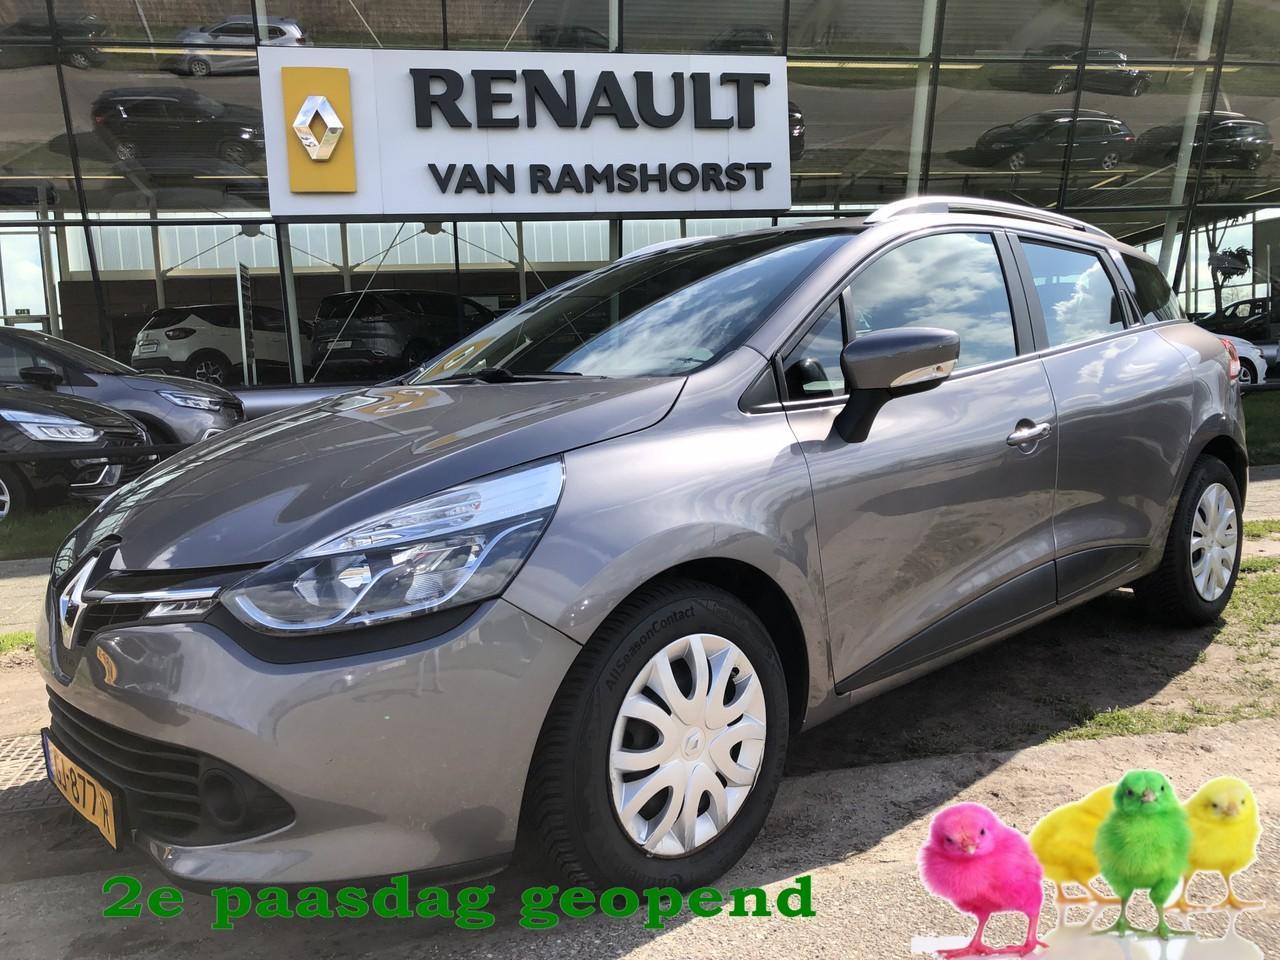 Renault Clio Estate 1.5 dci eco expression medianav airco cruise 2e paasdag open 10.00 - 17.00 uur